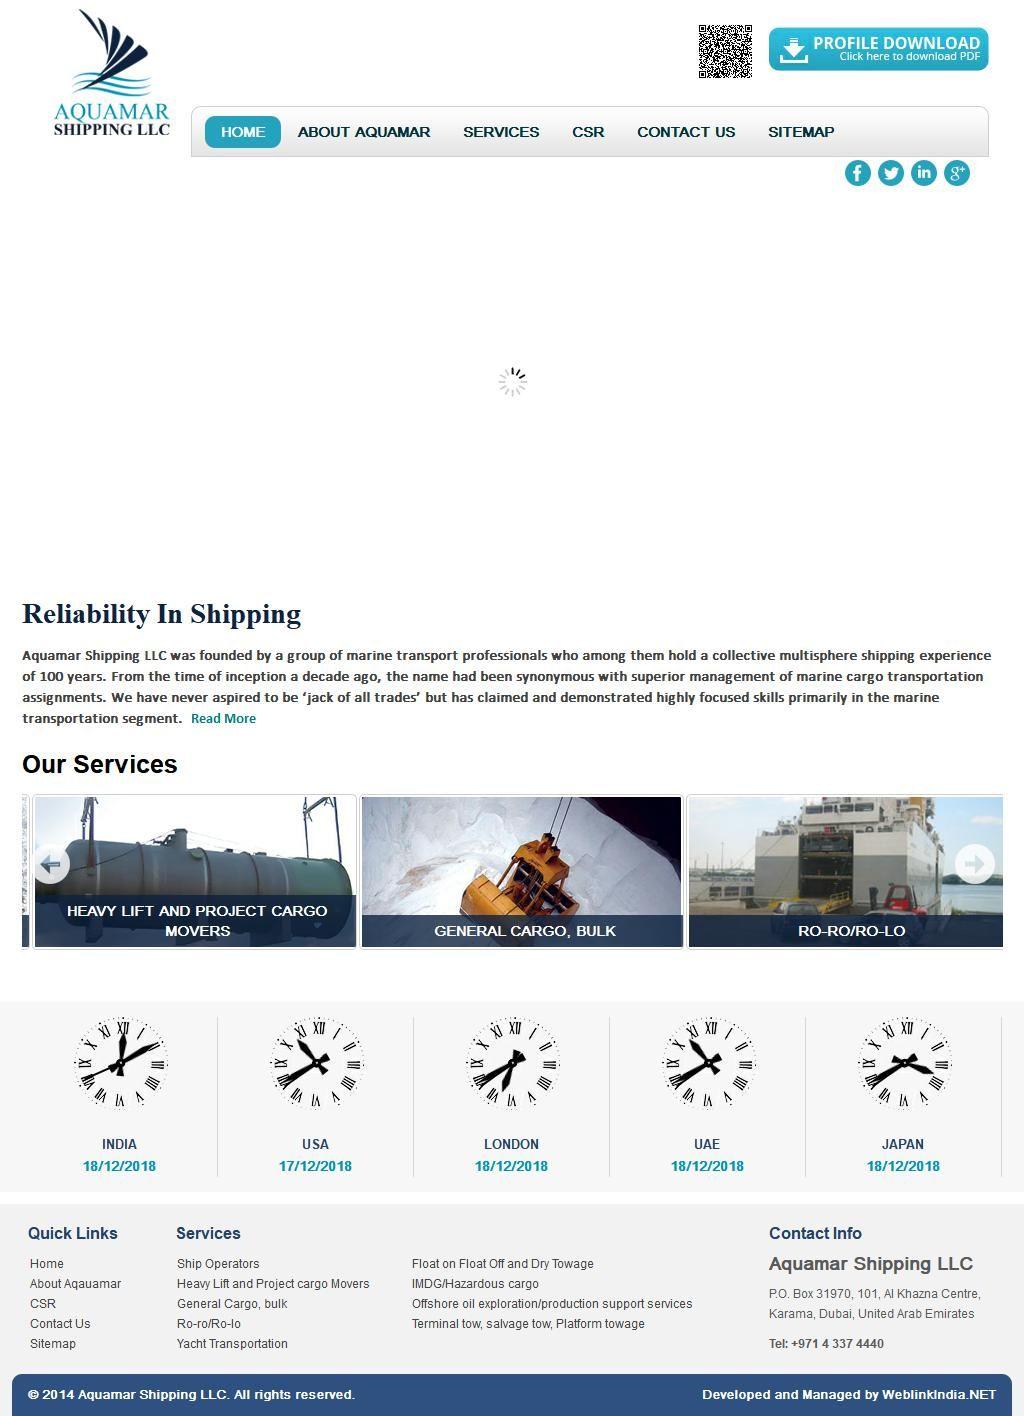 Aquamar Shipping, Llc Al Khazna Center, 35, 27b Street 1